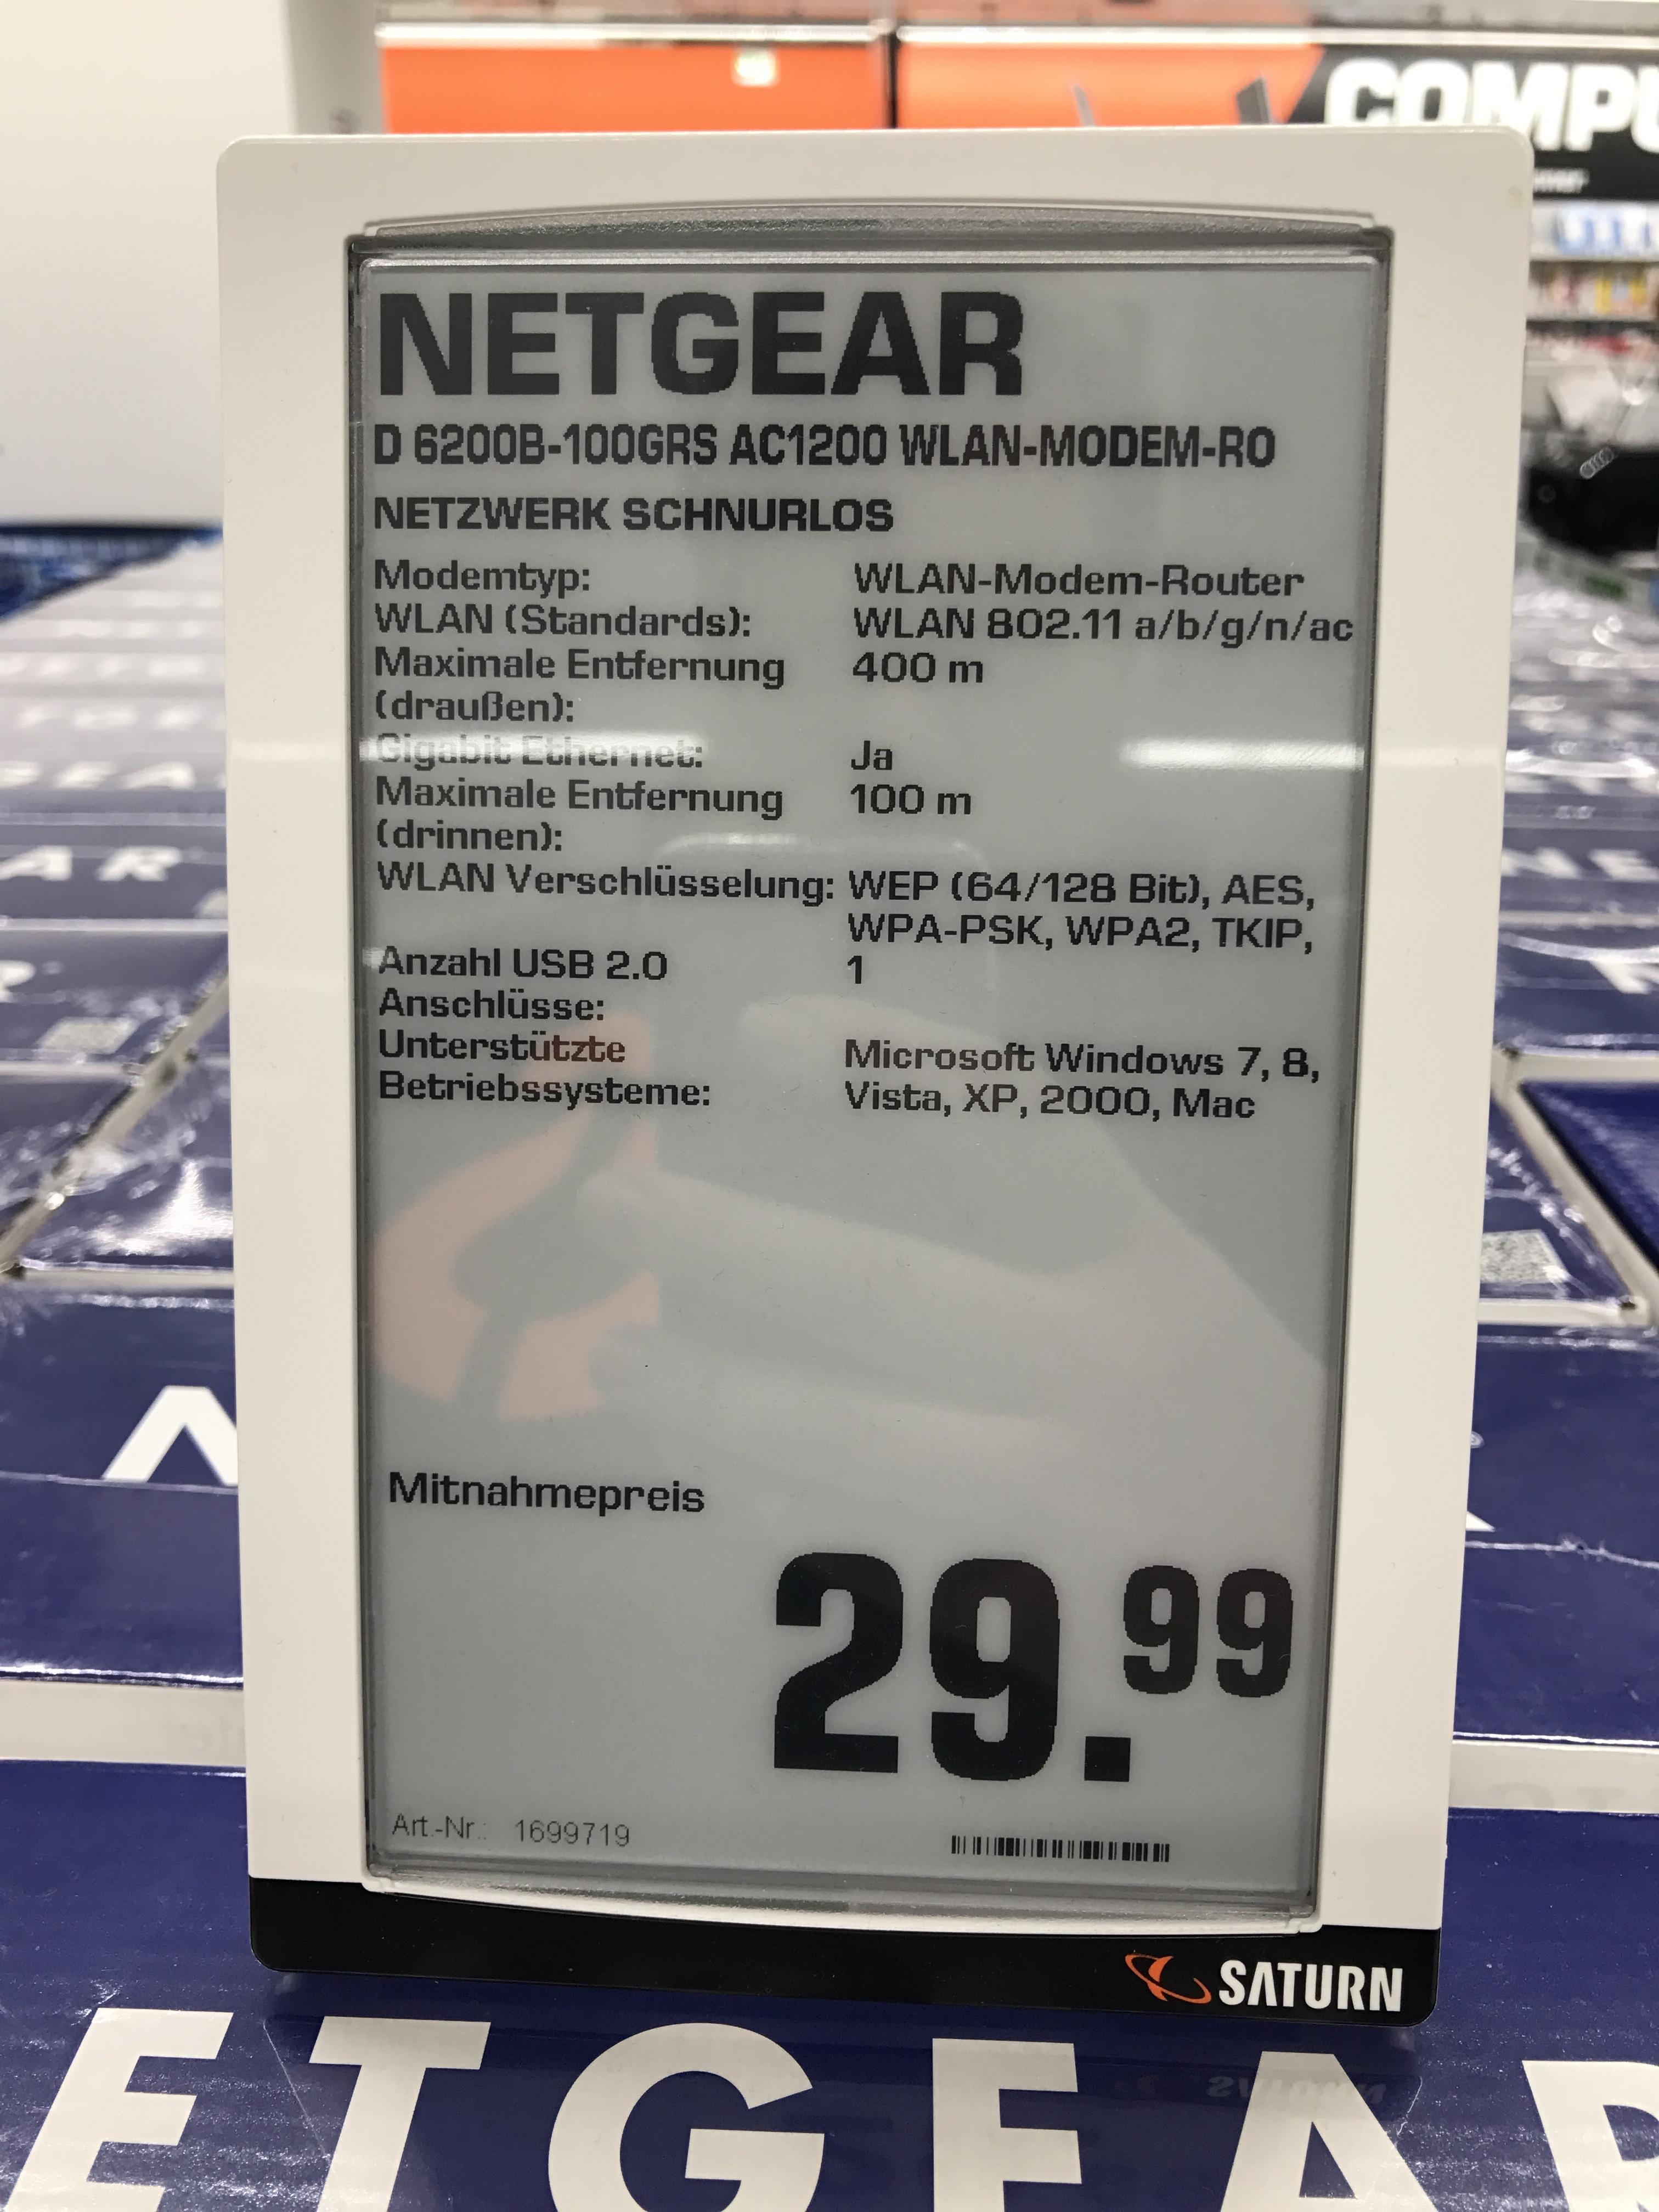 [Lokal] Saturn Ludwigsburg Netgear D6200B Wlan Modemrouter 29,99€ Idealo: 95,99€